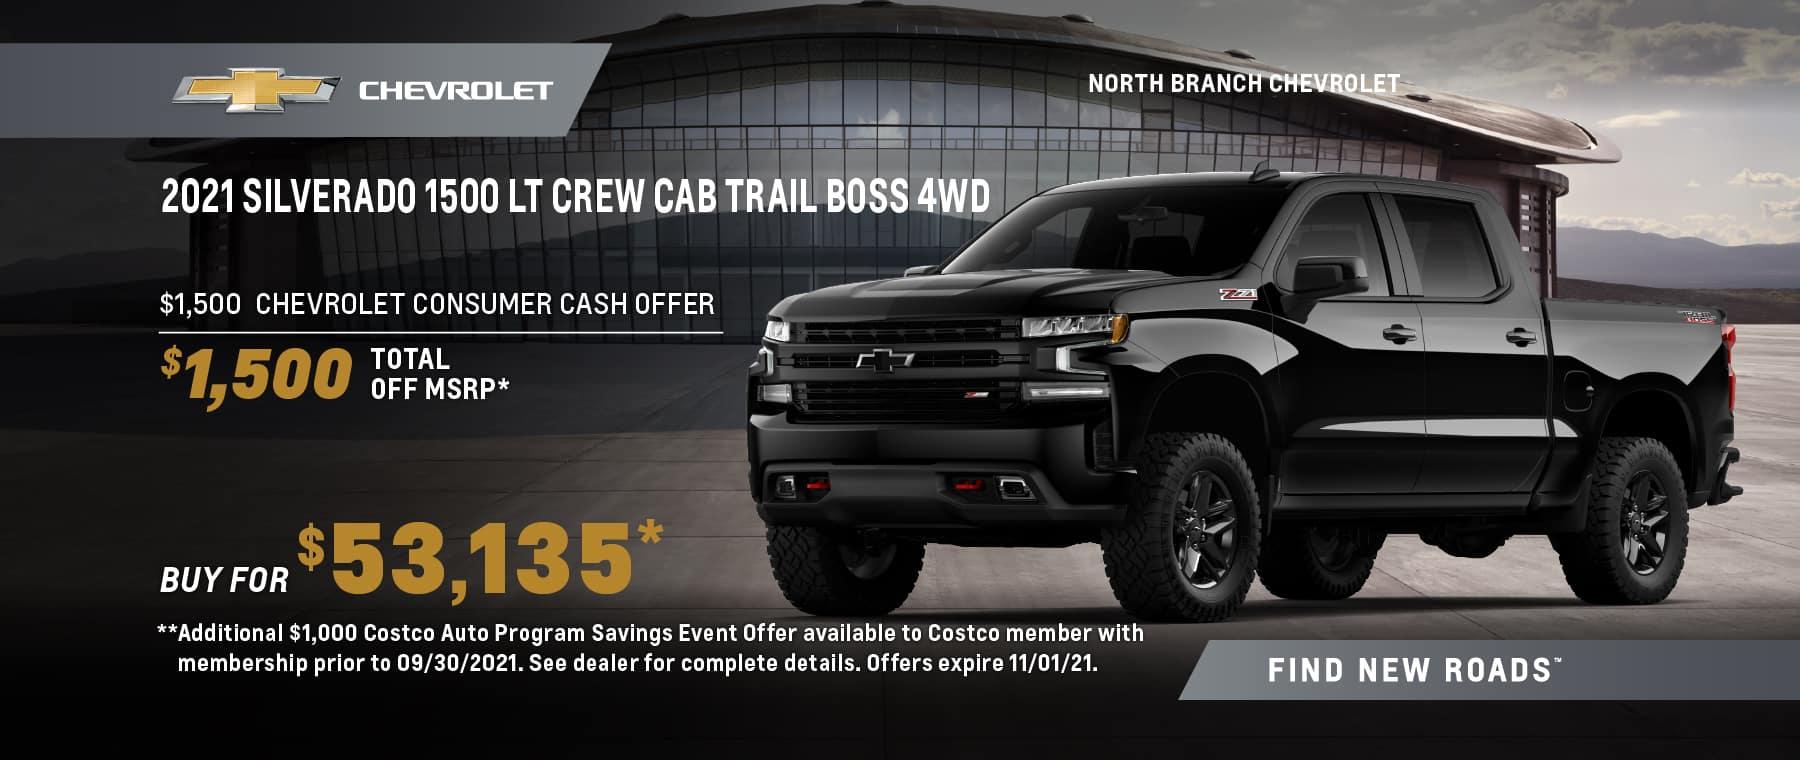 2021 CHEVROLET SILVERADO 1500 CREW CAB LT TRAIL BOSS 4WD